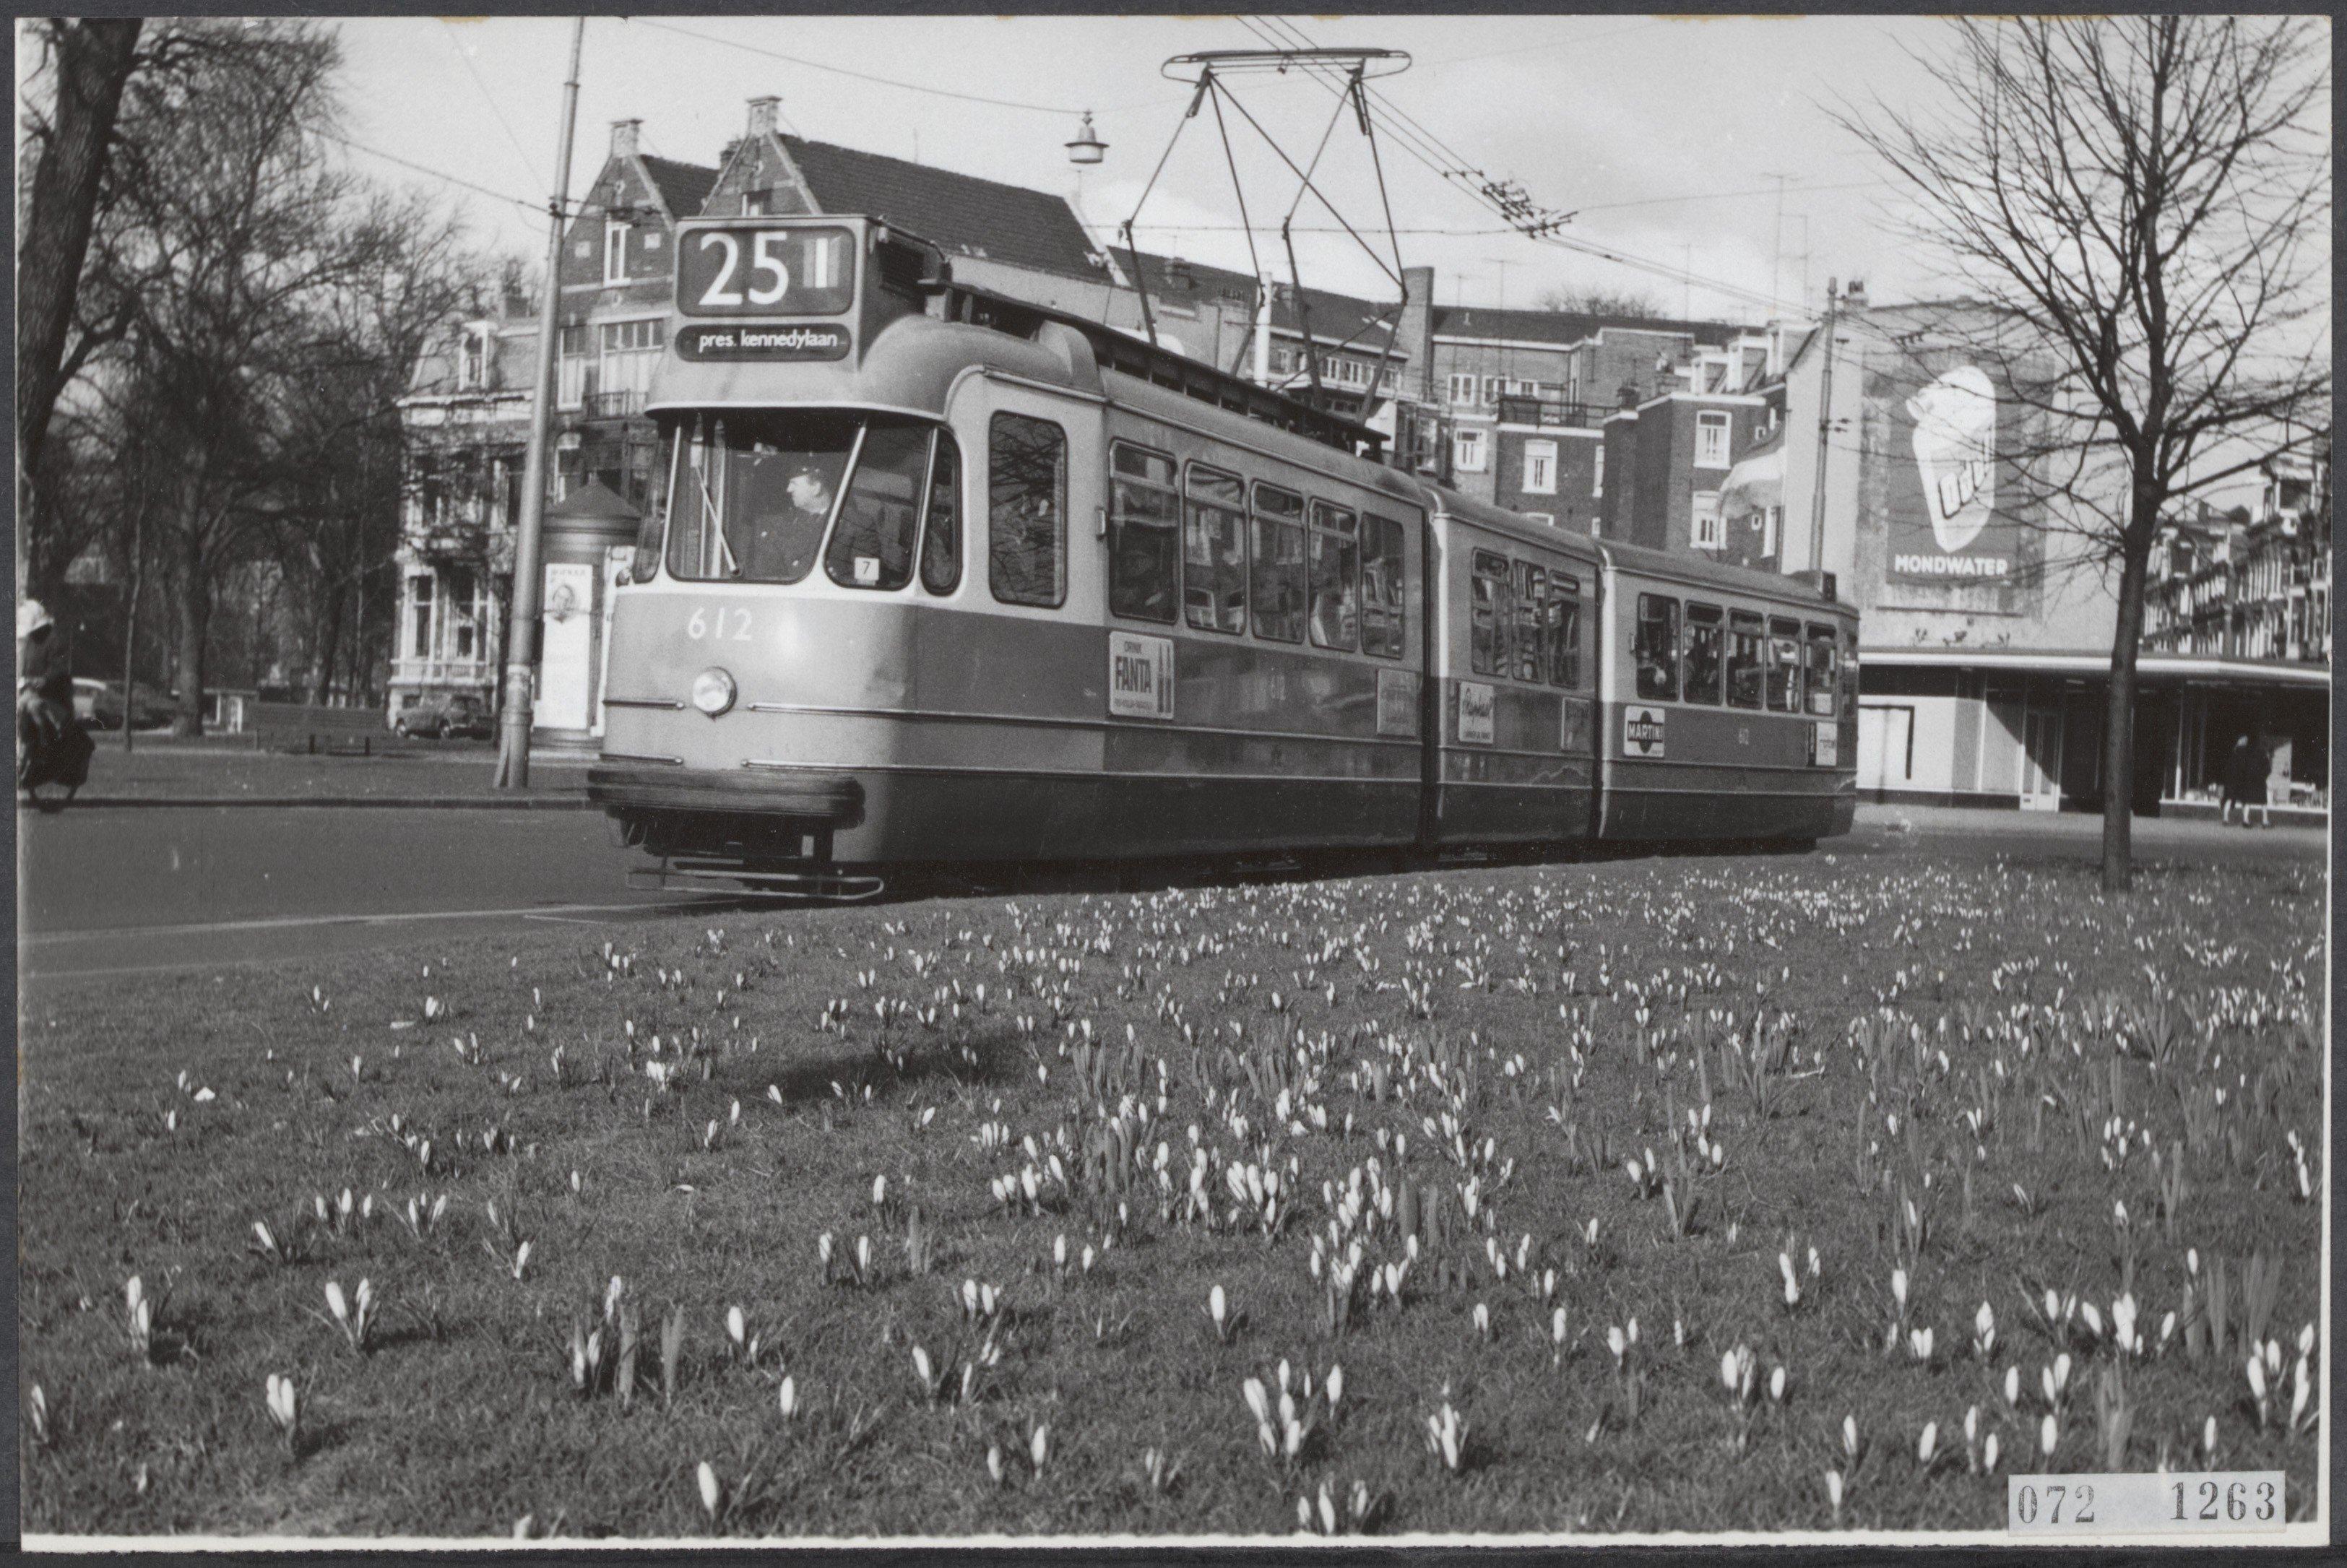 bf89e9ab6a File:Lente, plantsoenen, trams, weteringcircuit, Bestanddeelnr 072-1263.jpg